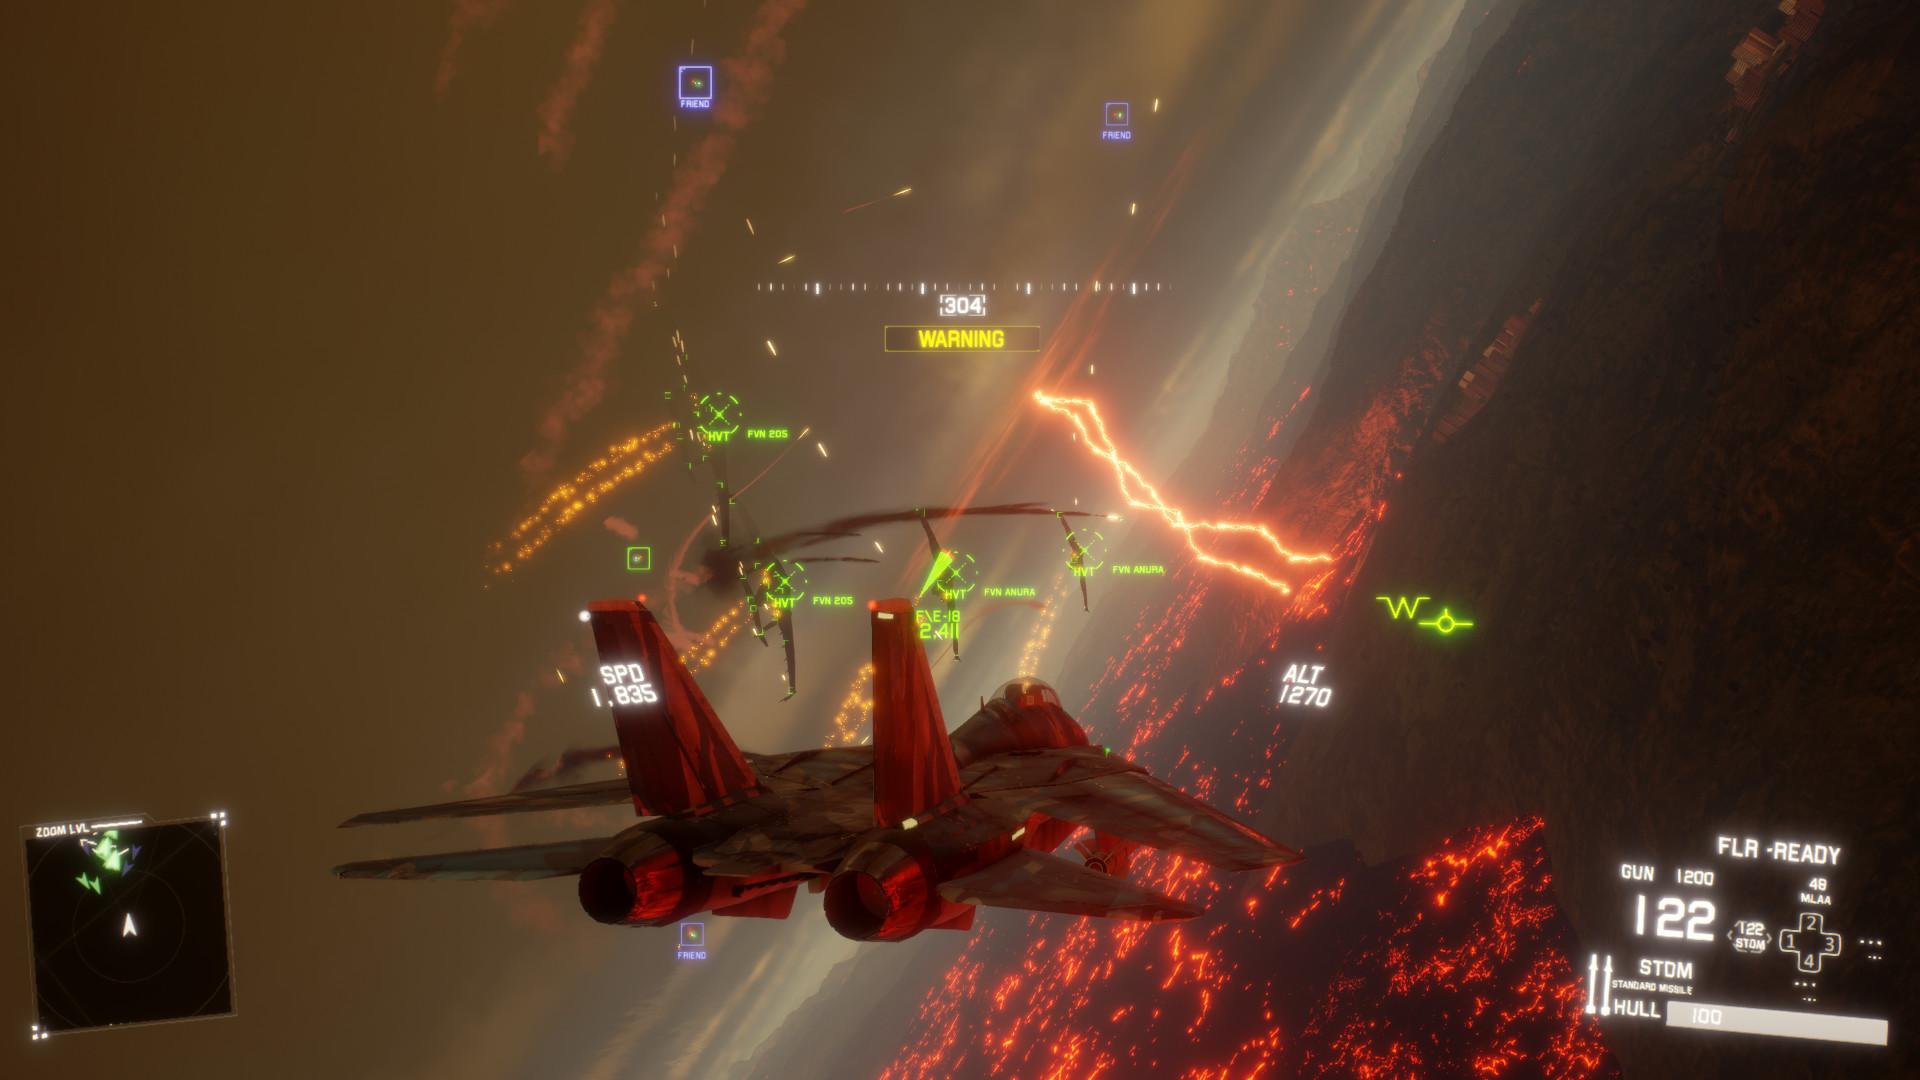 project-wingman-pc-screenshot-04